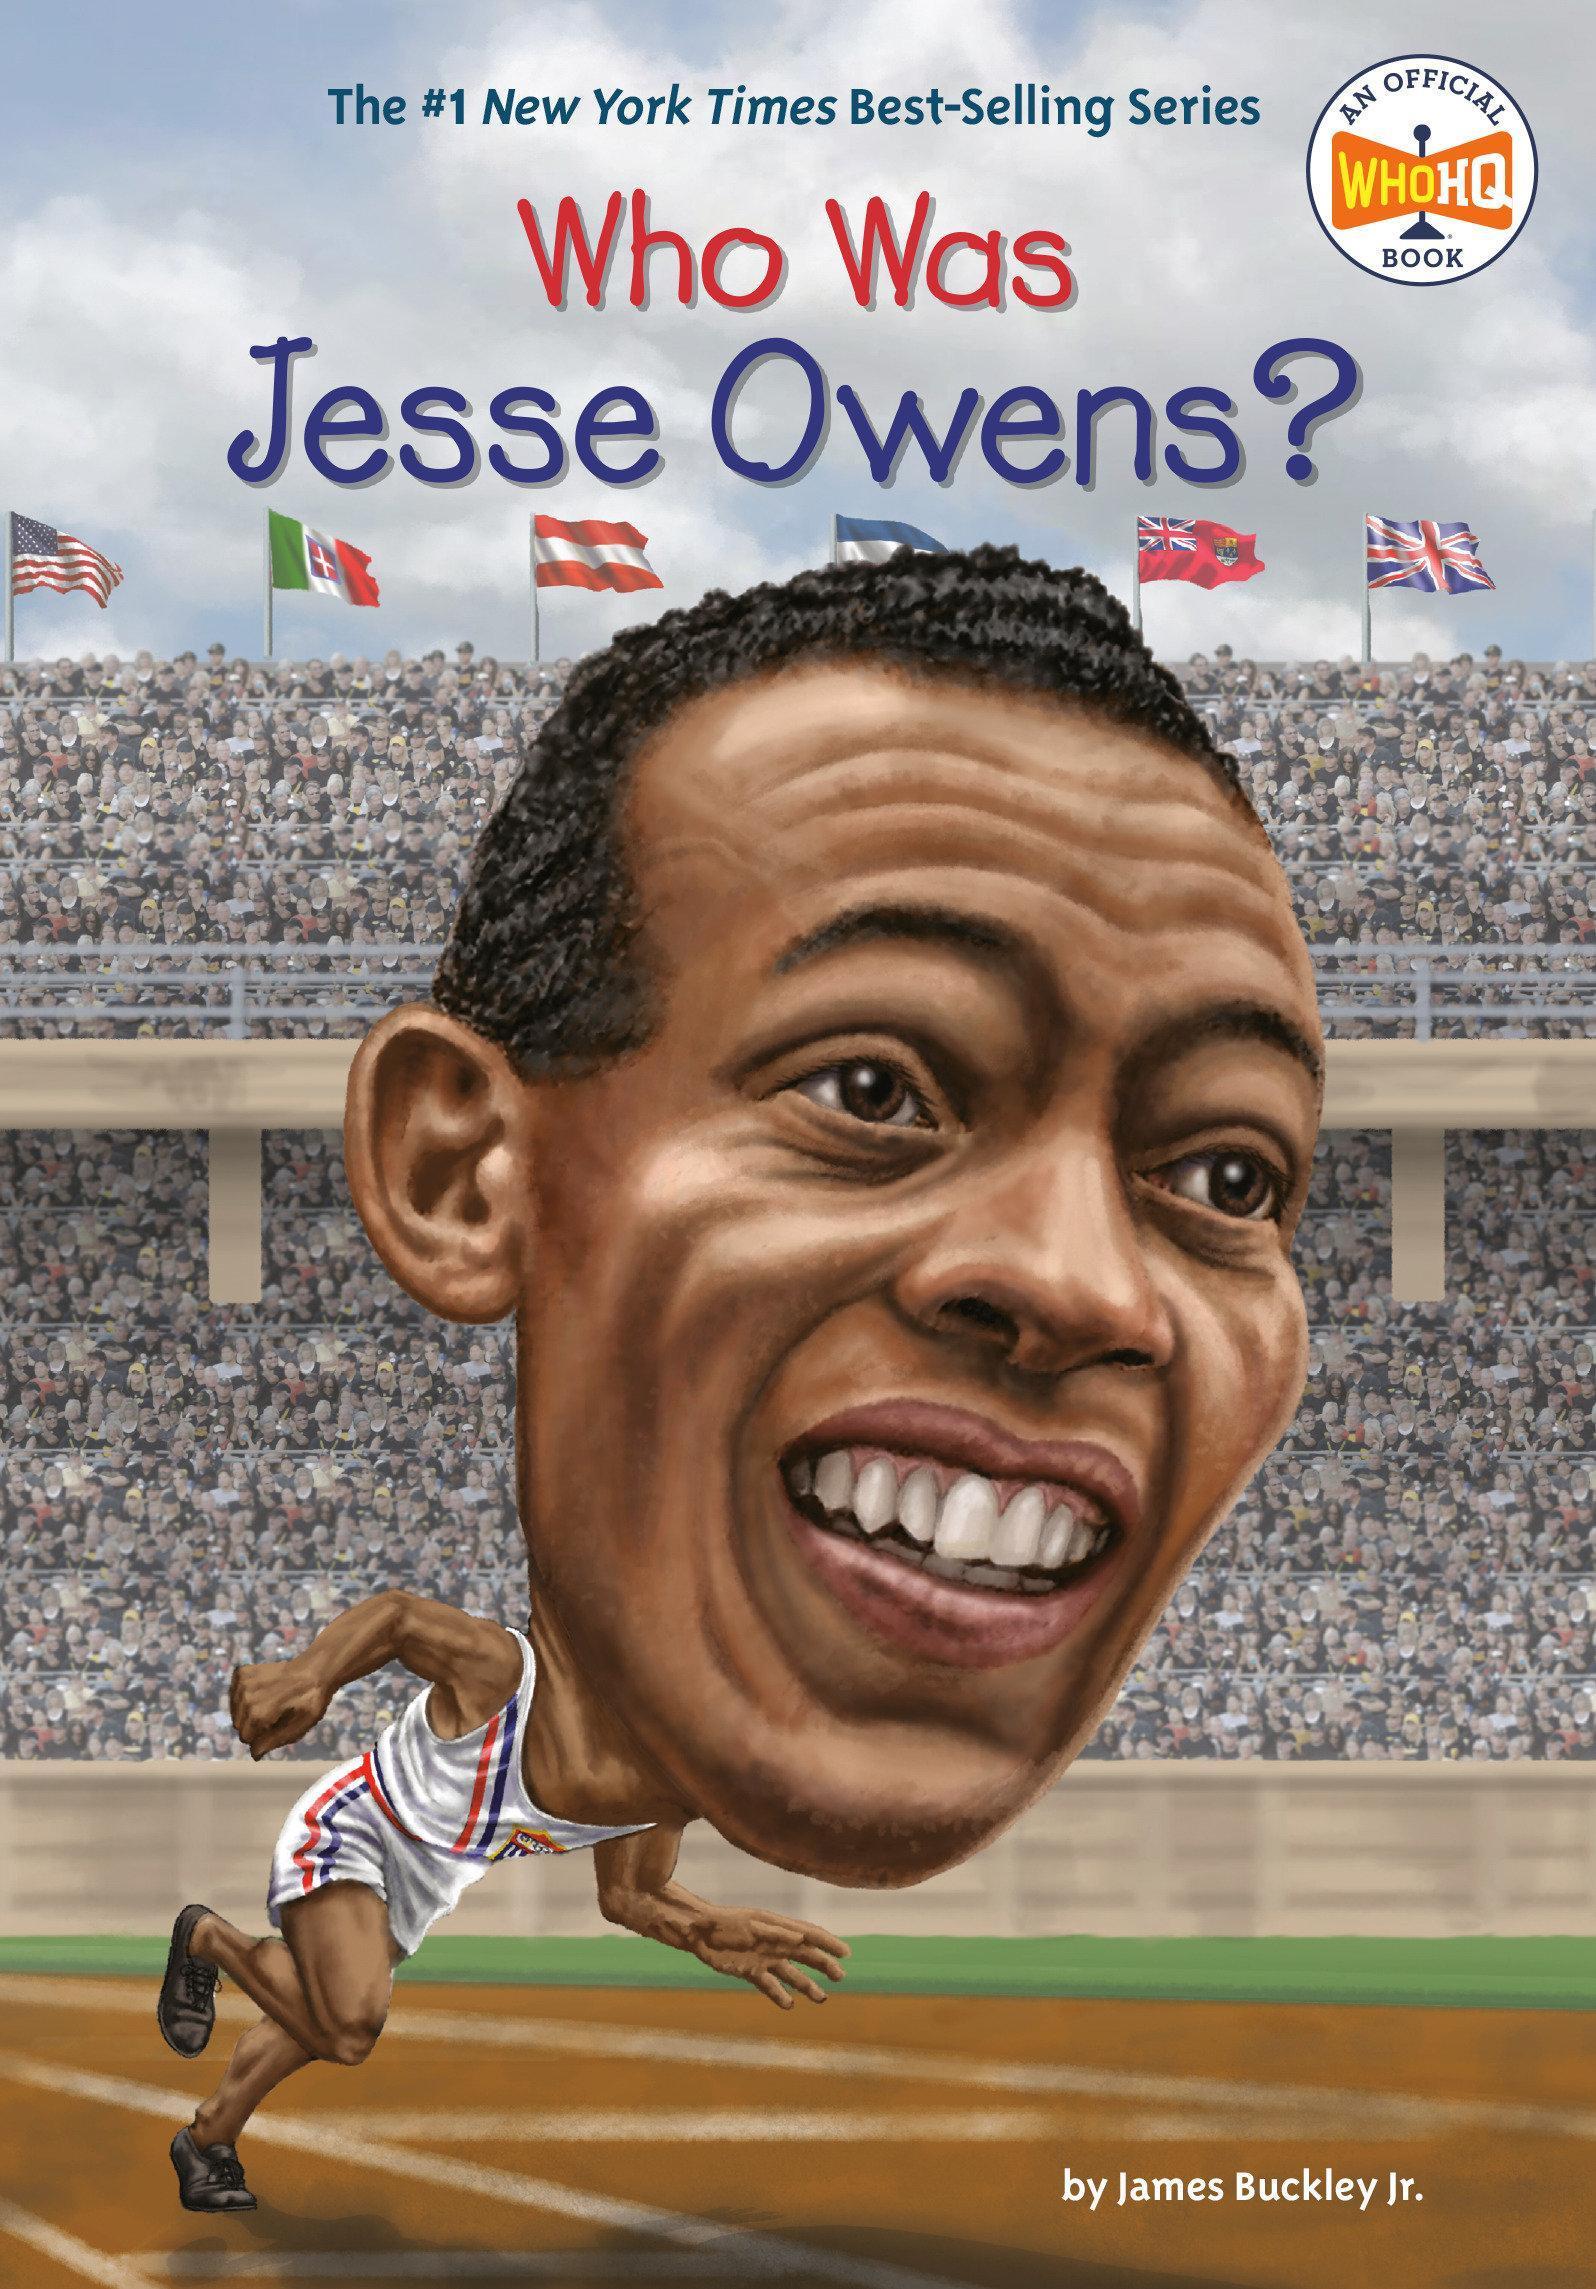 Who Was Jesse Owens? James Buckley